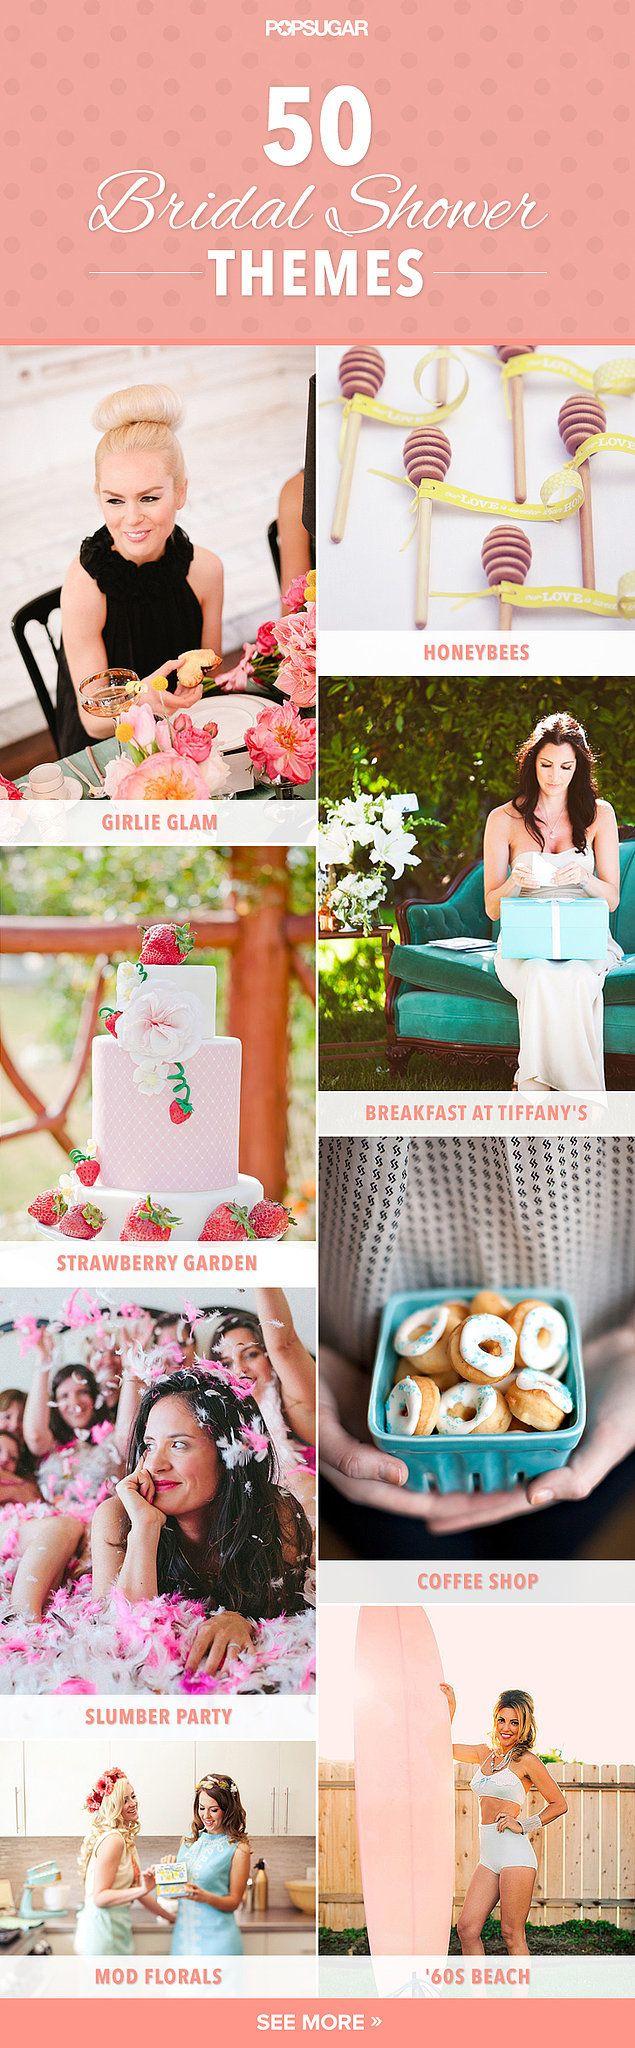 fun ideas for bridal shower themes%0A    Bridal Shower Theme Ideas